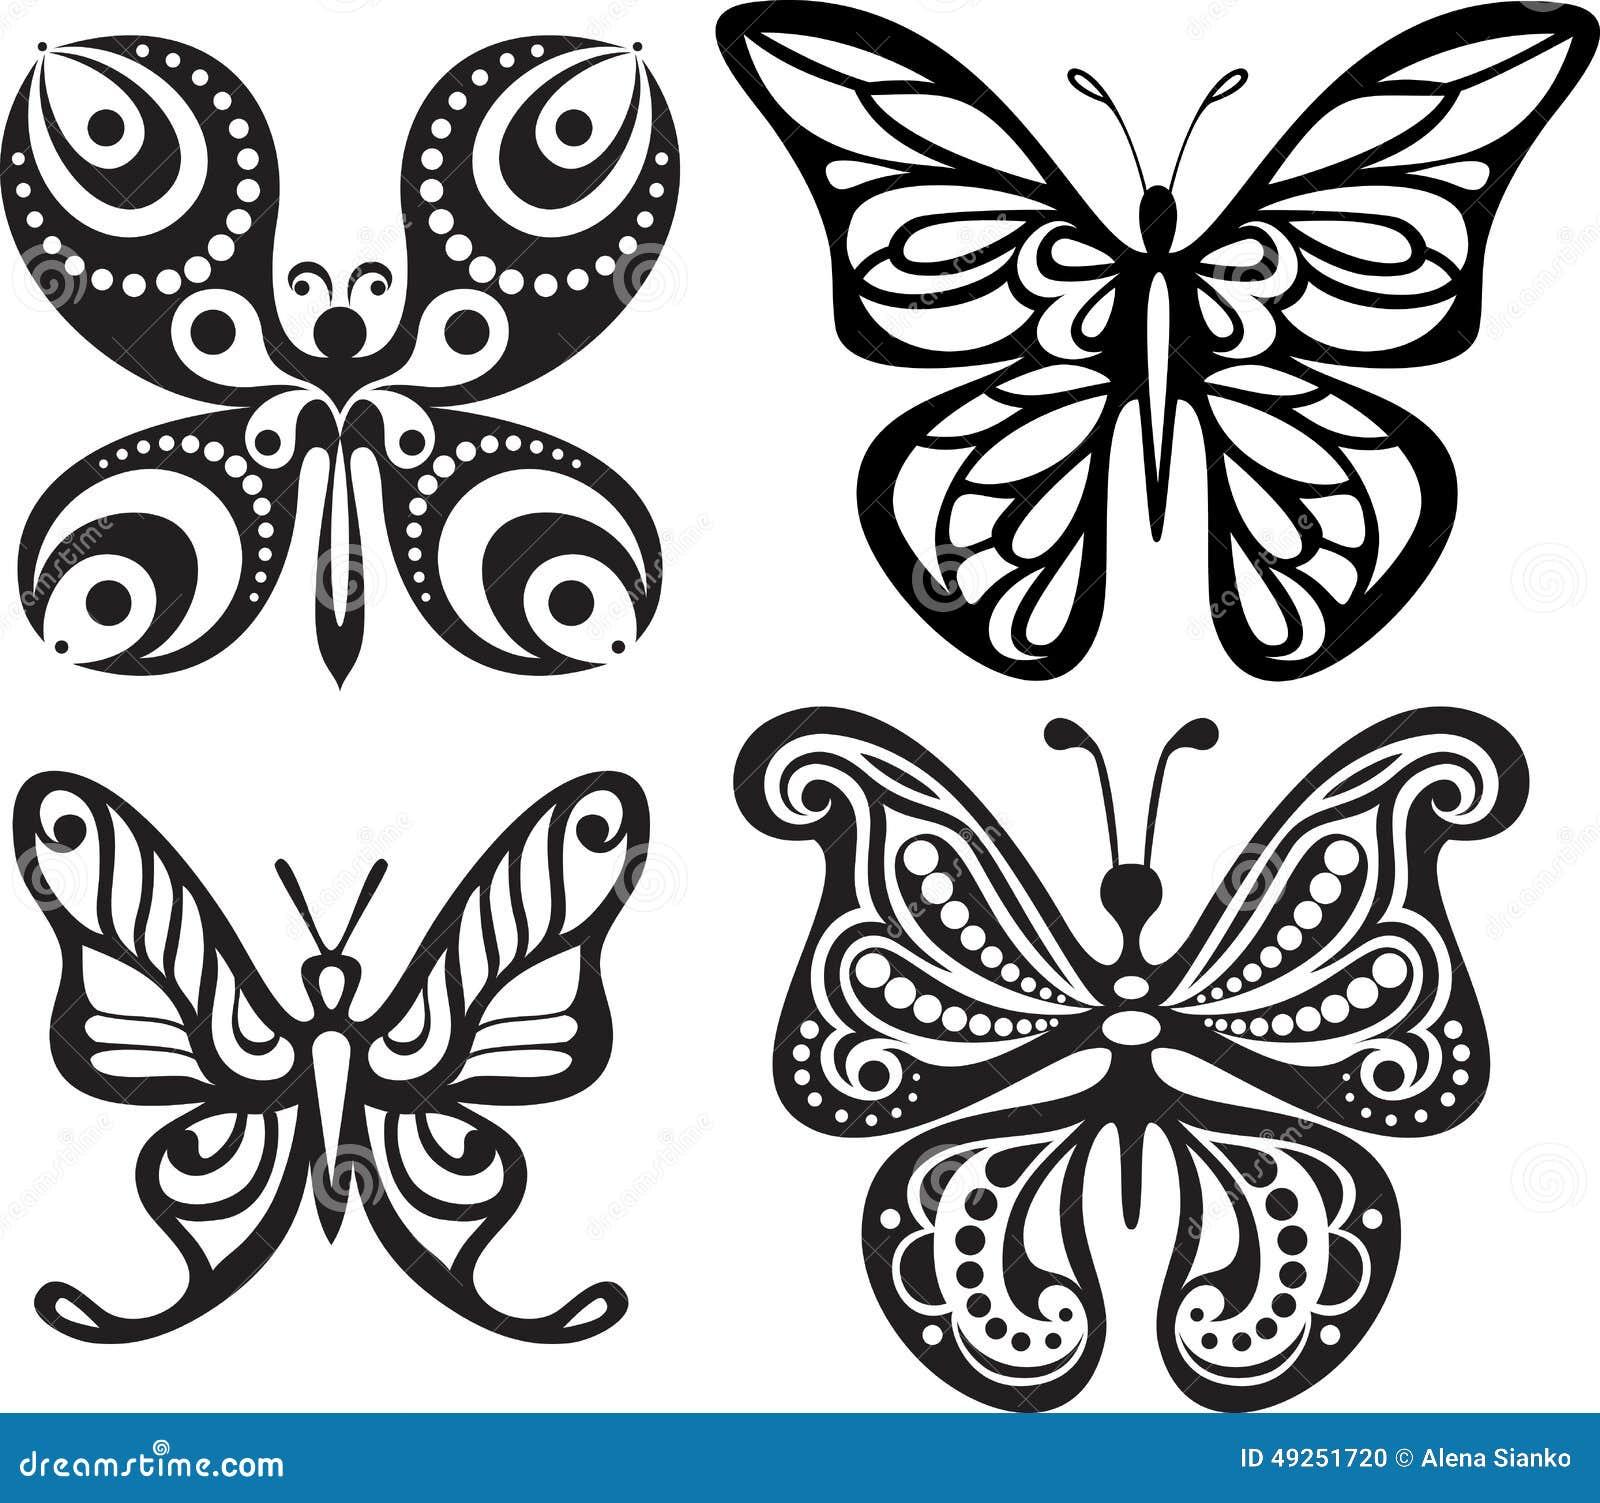 Рисуем узоры на бабочках